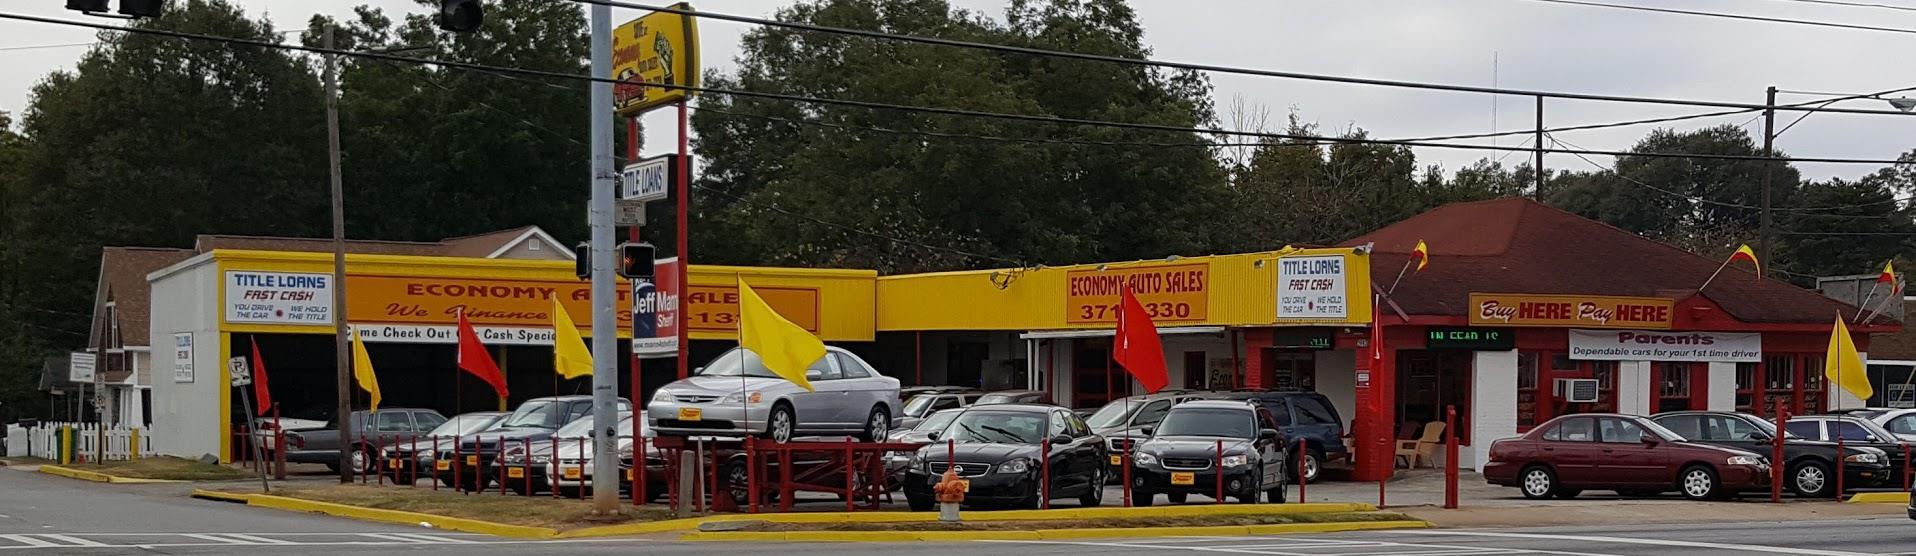 Used Cars Decatur GA   Used Cars & Trucks GA   Economy Auto